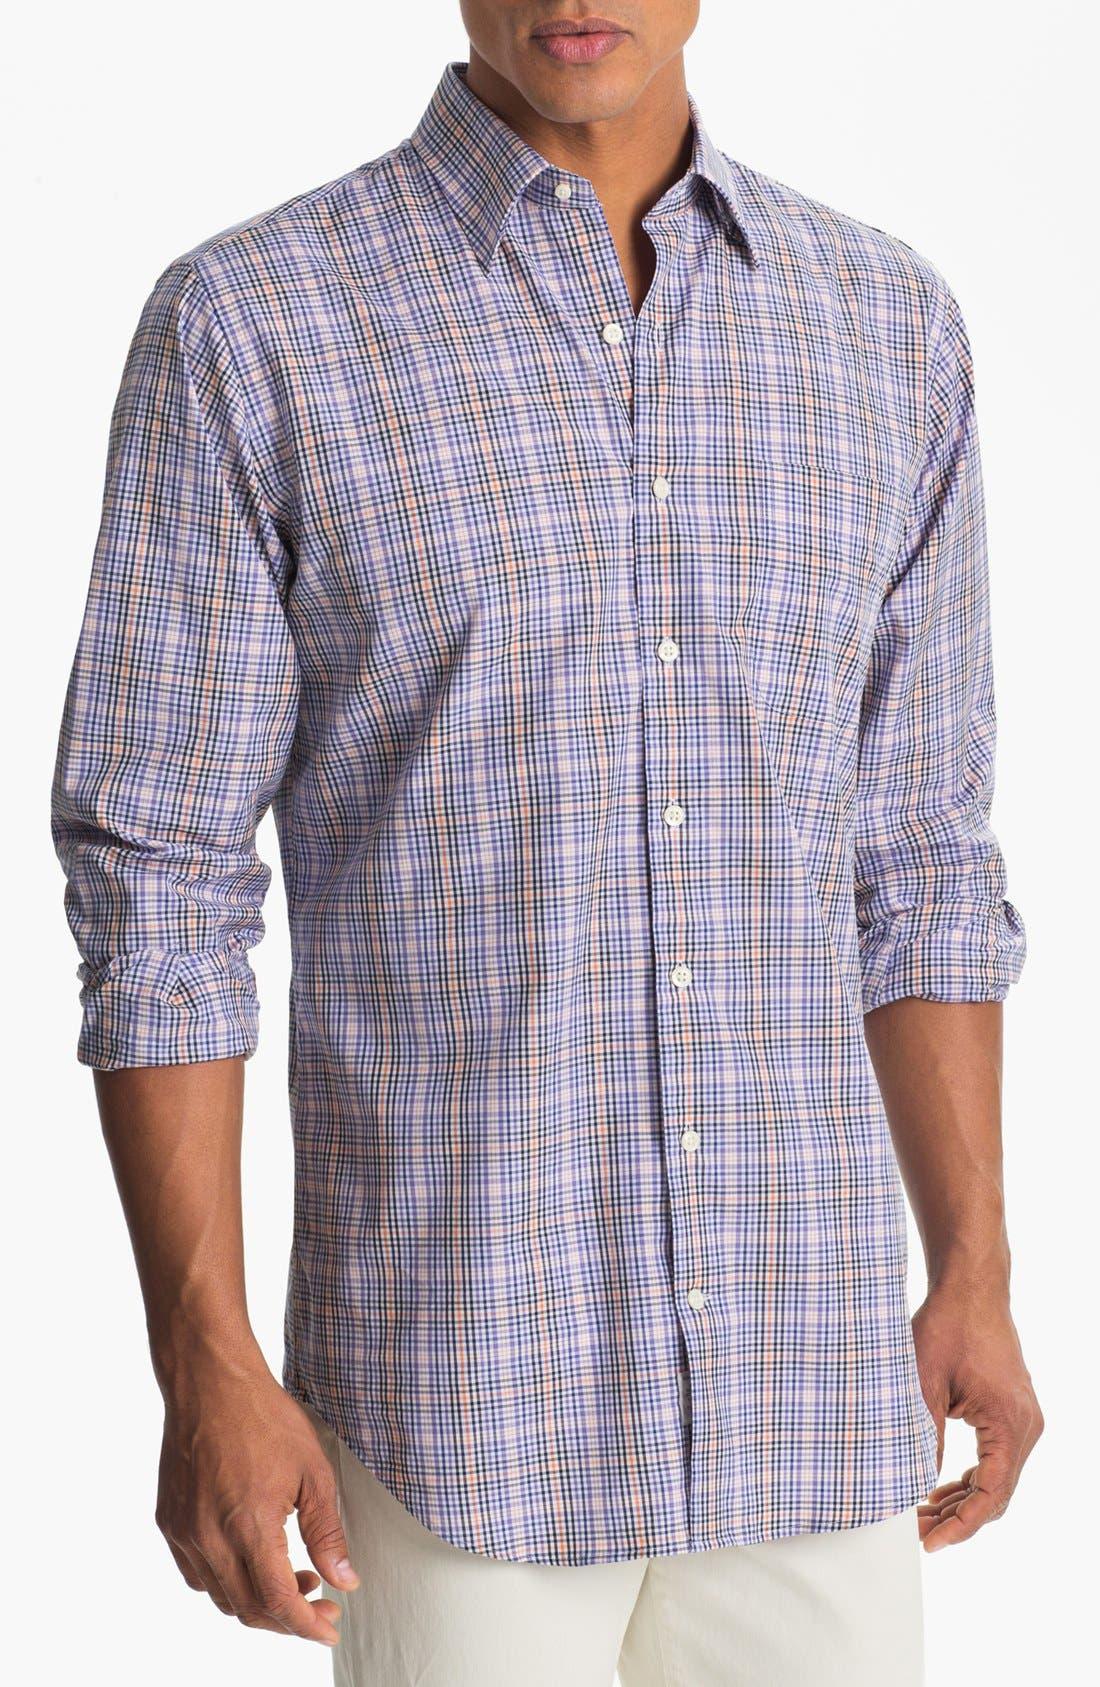 Alternate Image 1 Selected - Peter Millar Sport Shirt (Tall)